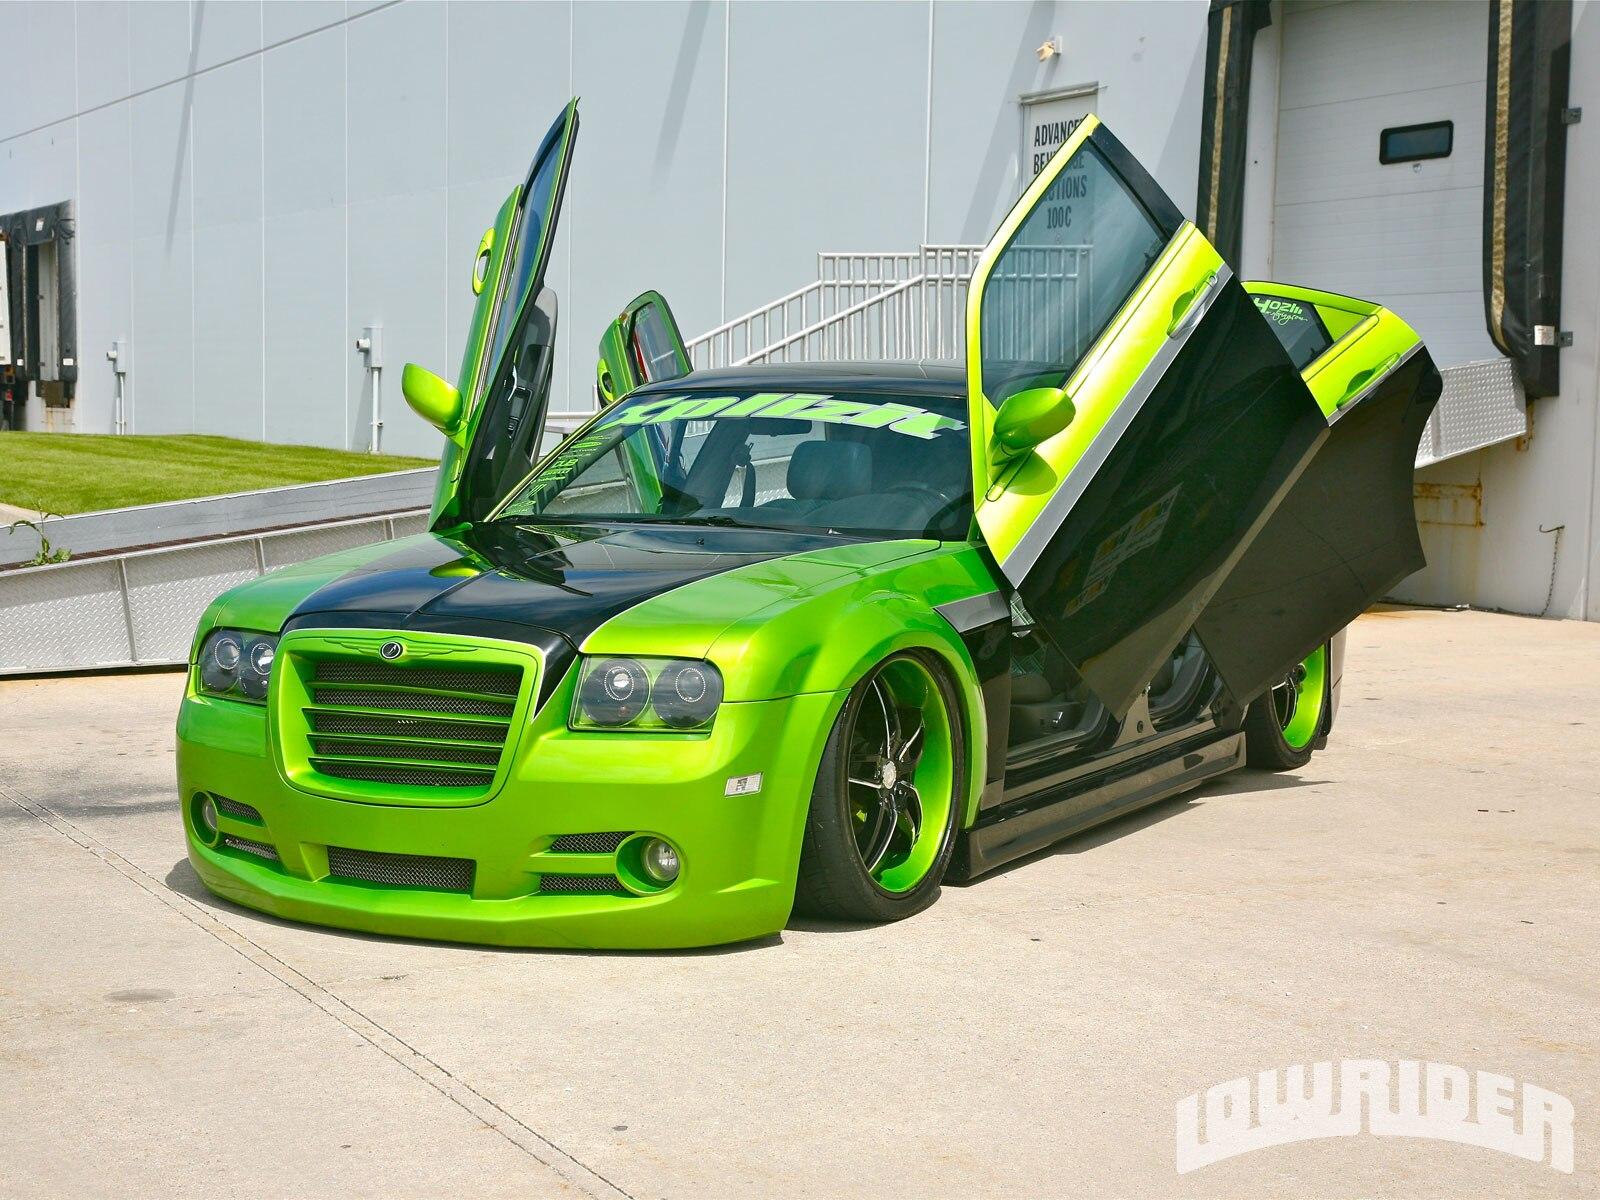 2005 Chrysler 300c Lowrider Magazine